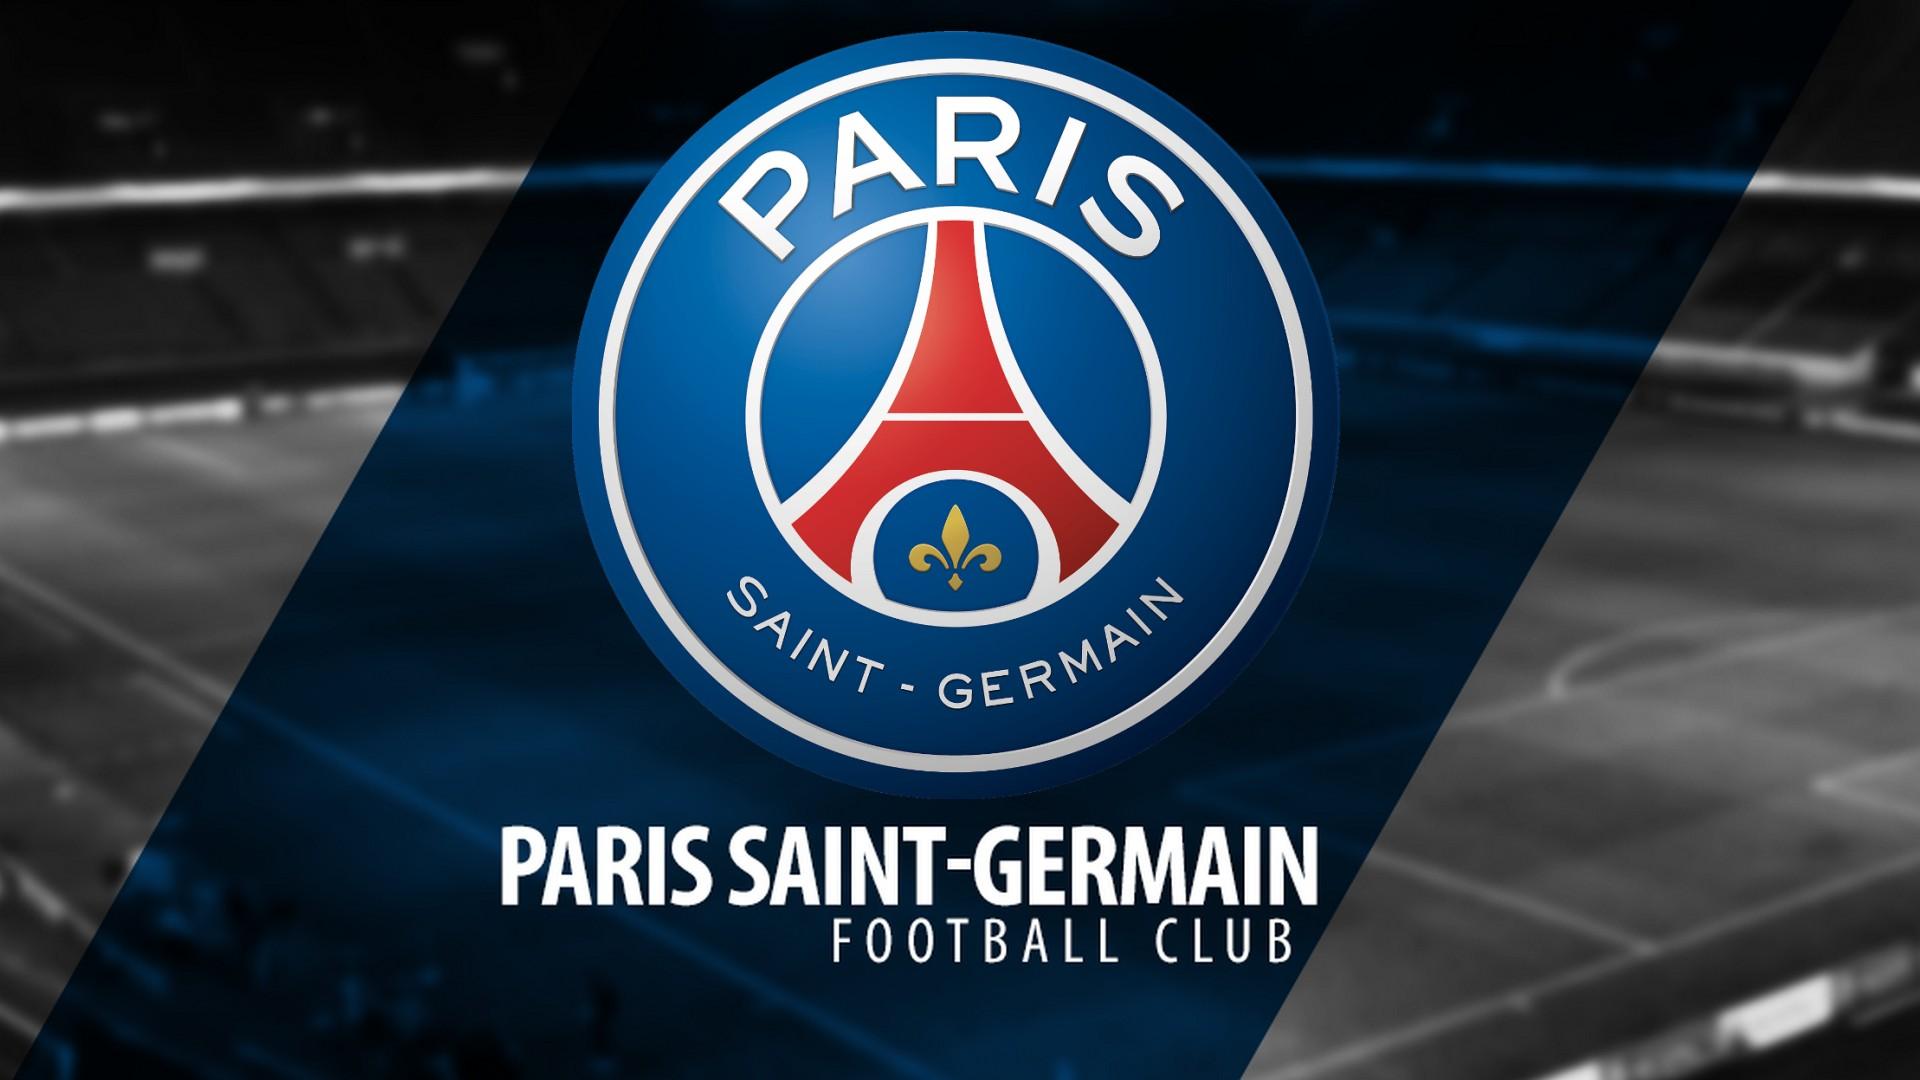 Paris Saint Germain Wallpaper HD 2019 Football Wallpaper 1920x1080